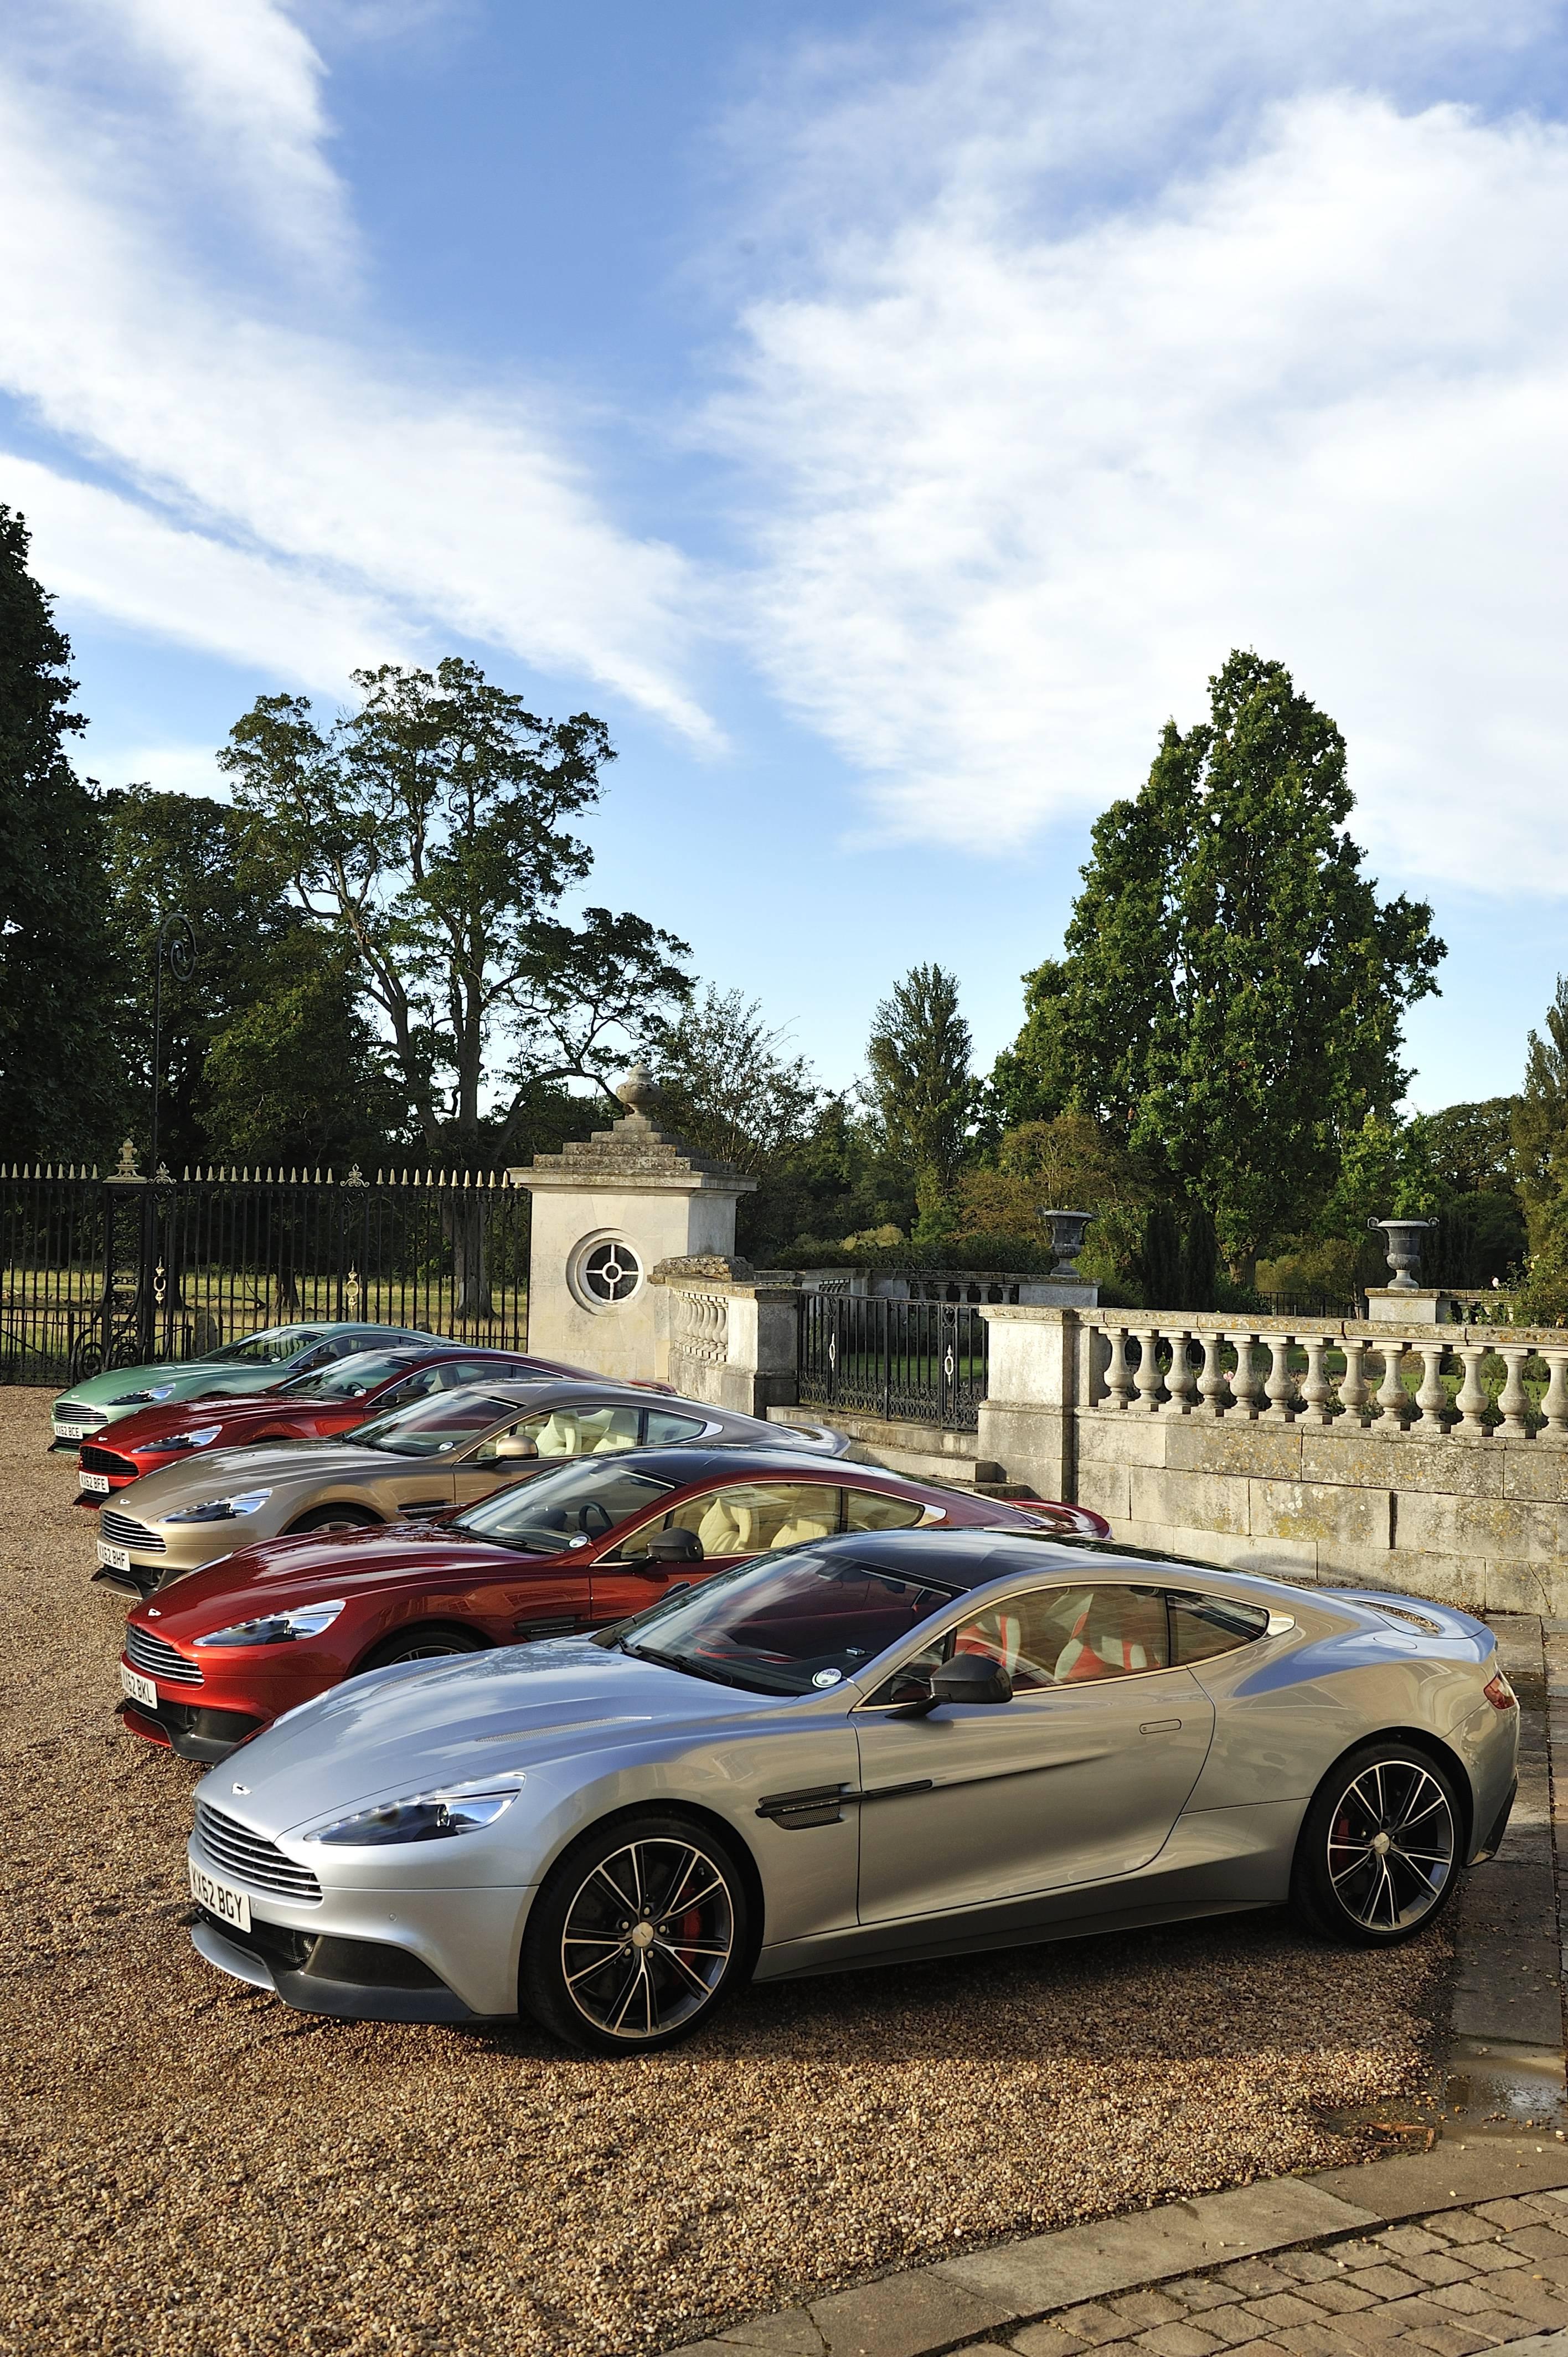 Aston Martin Unveils Vanquish To US Market At South Florida - Aston martin florida